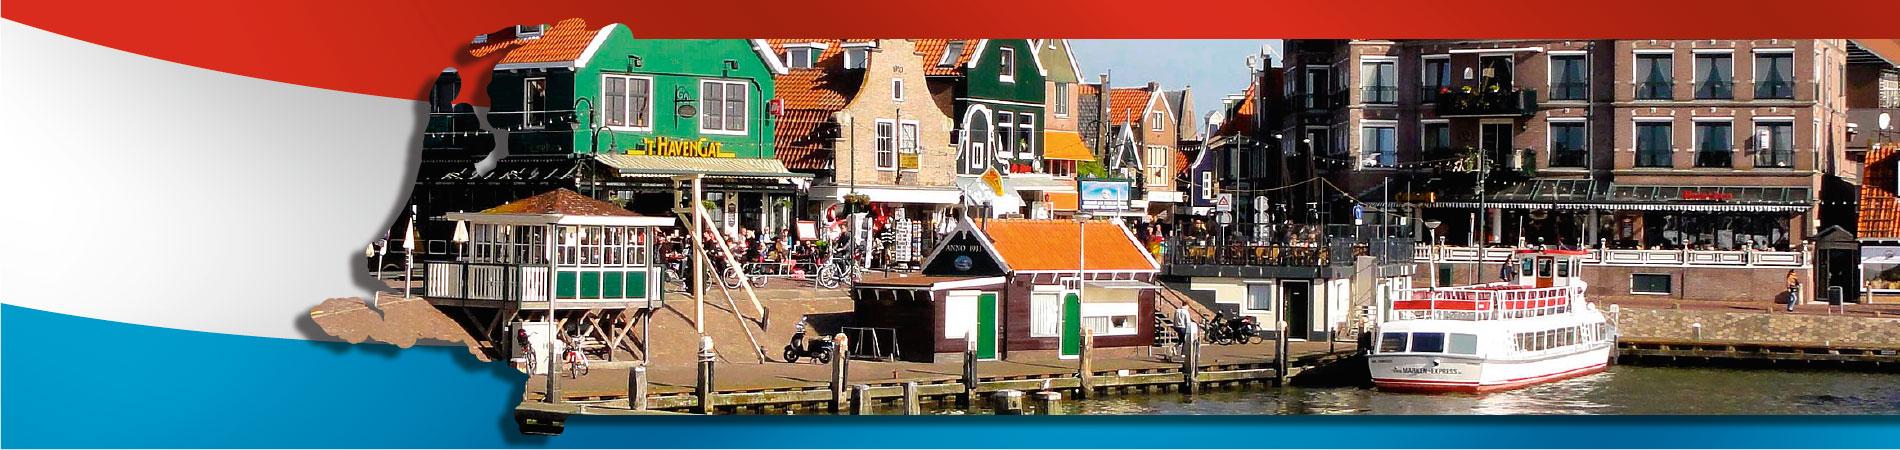 AMS Volendam tour